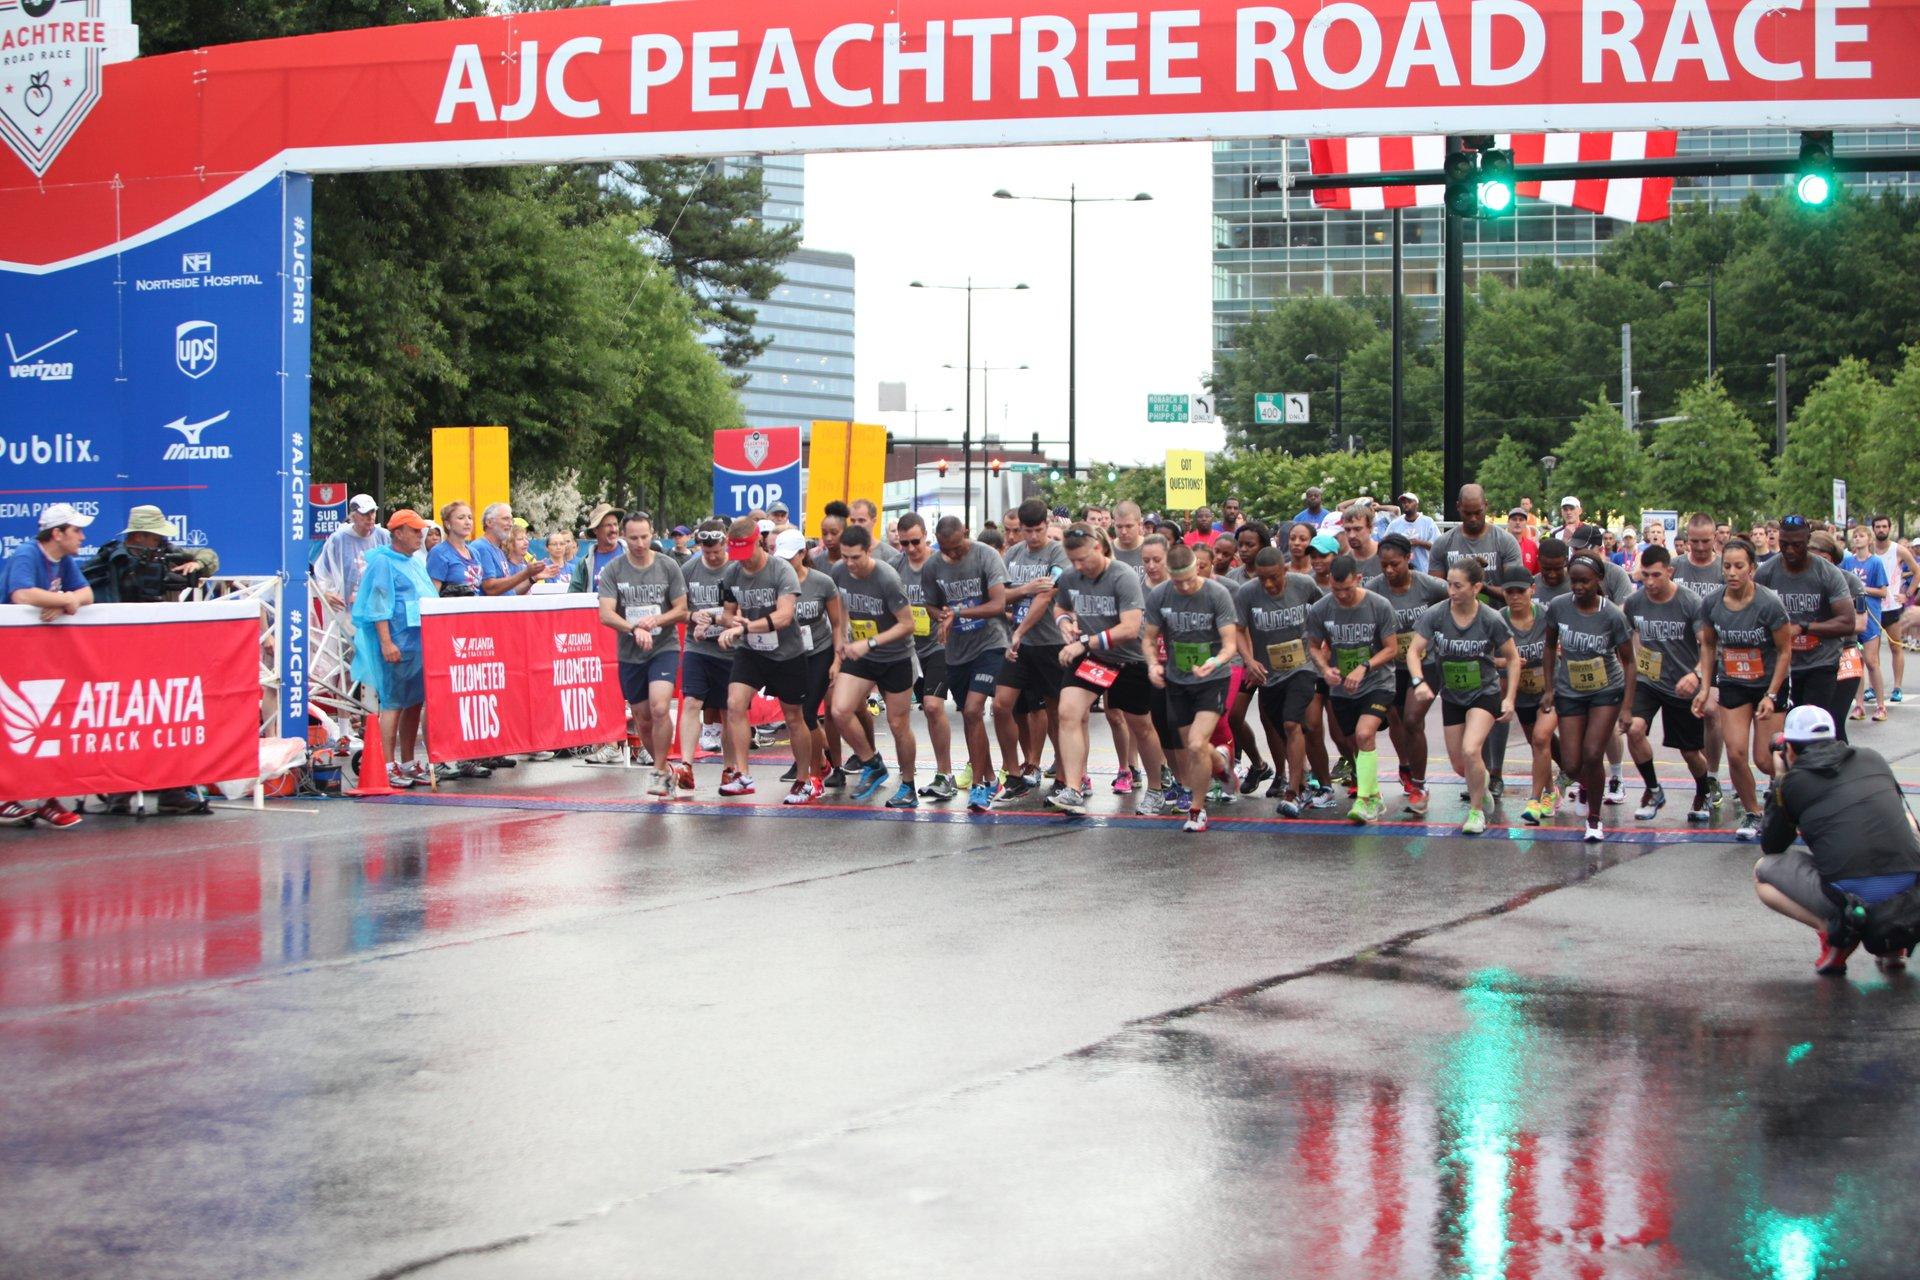 Peachtree Road Race Start 2020